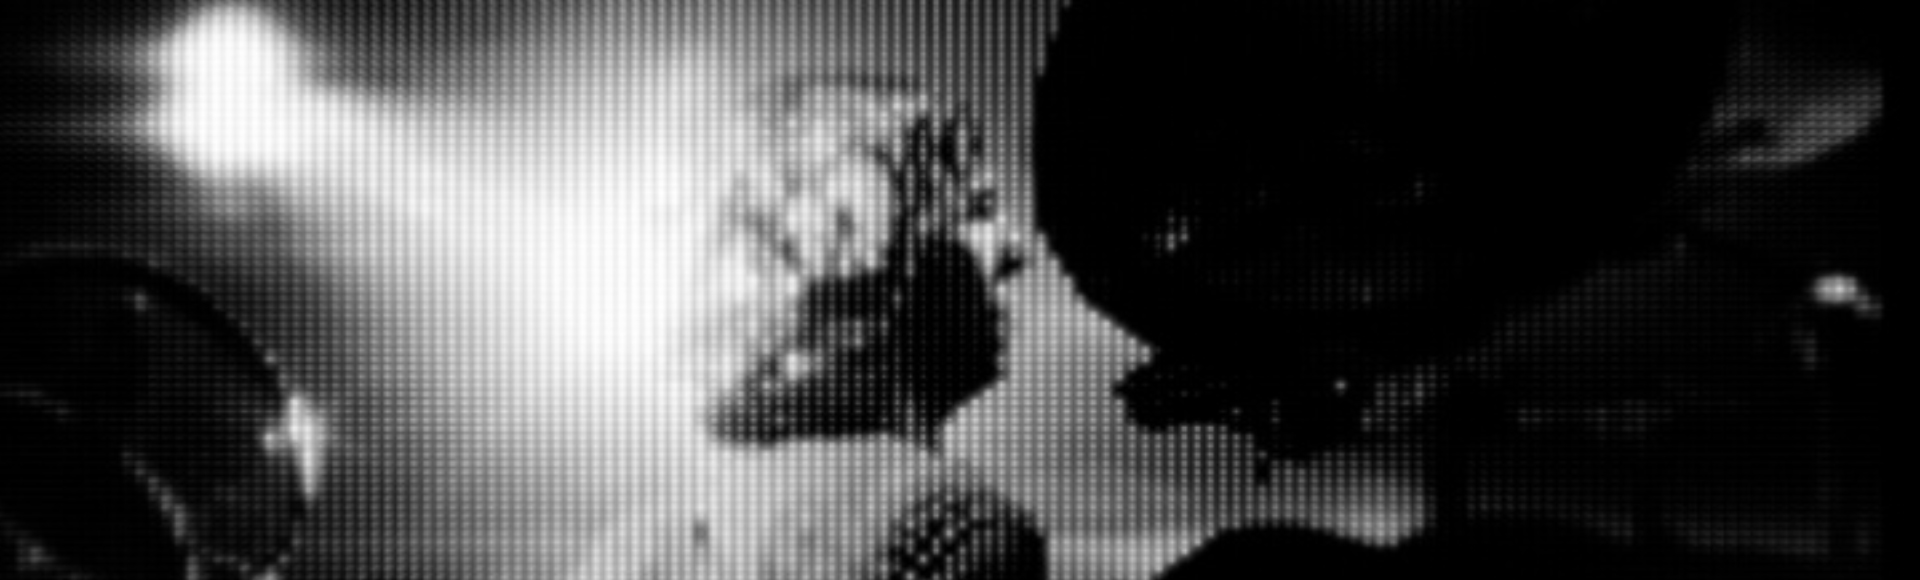 LP_Tsuns (0-00-04-03)_jpgm.jpg